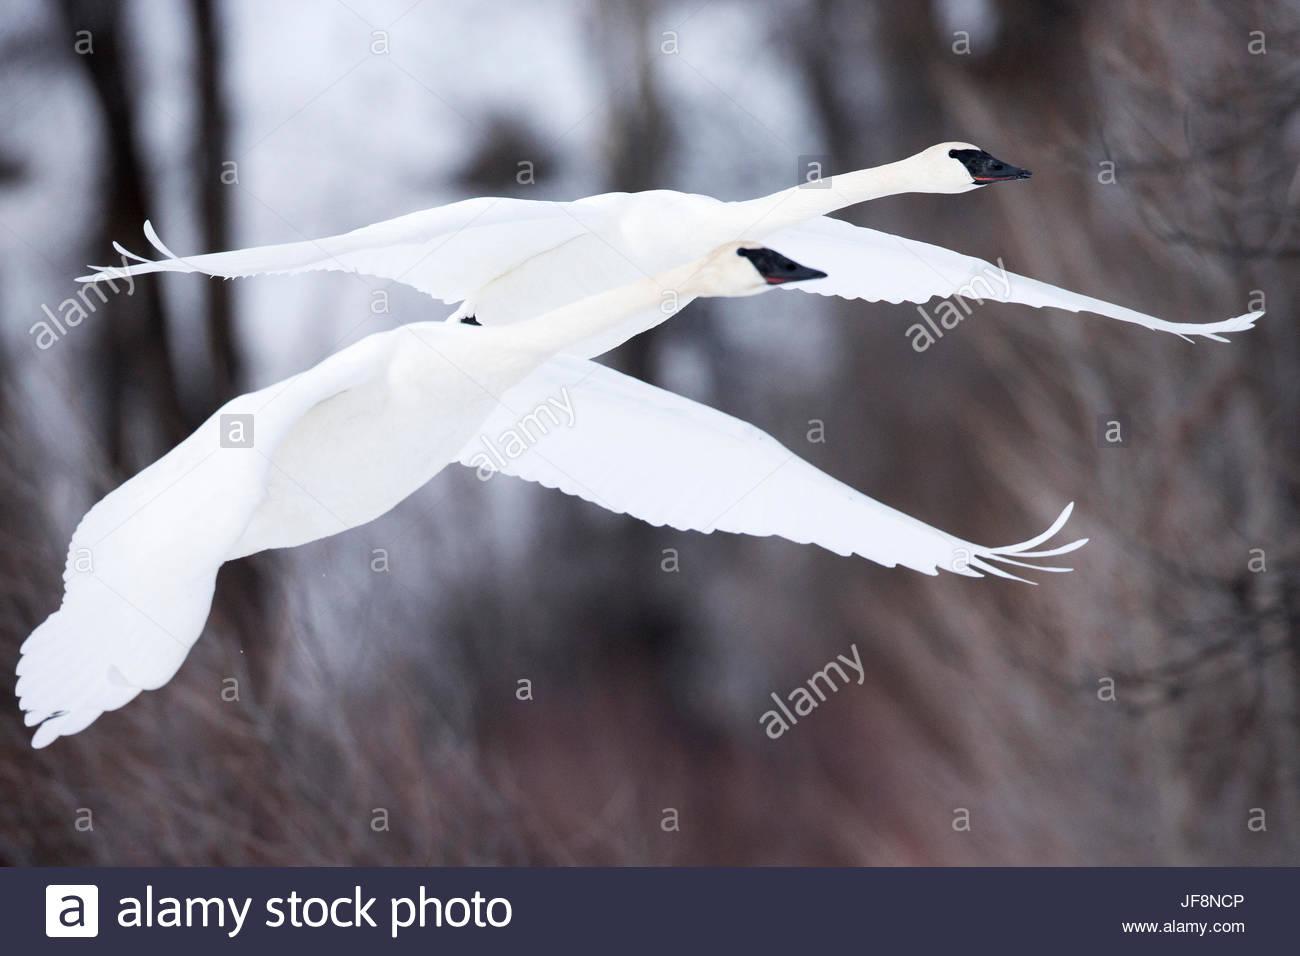 Two tundra swans, Cygnus columbianus, flying in unison. Stock Photo